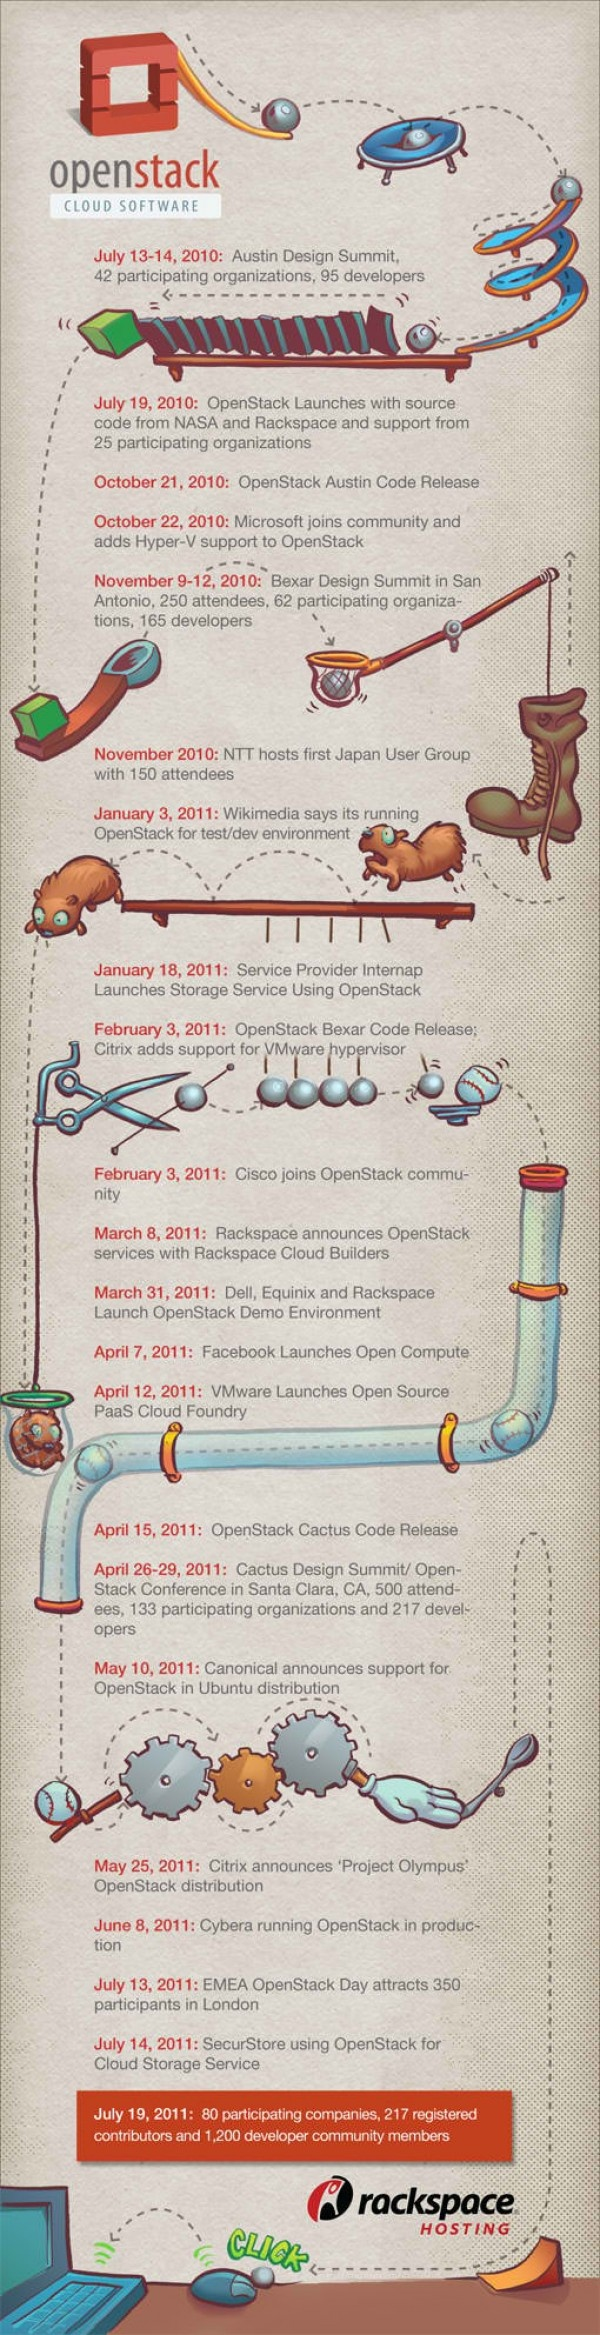 OpenStack History